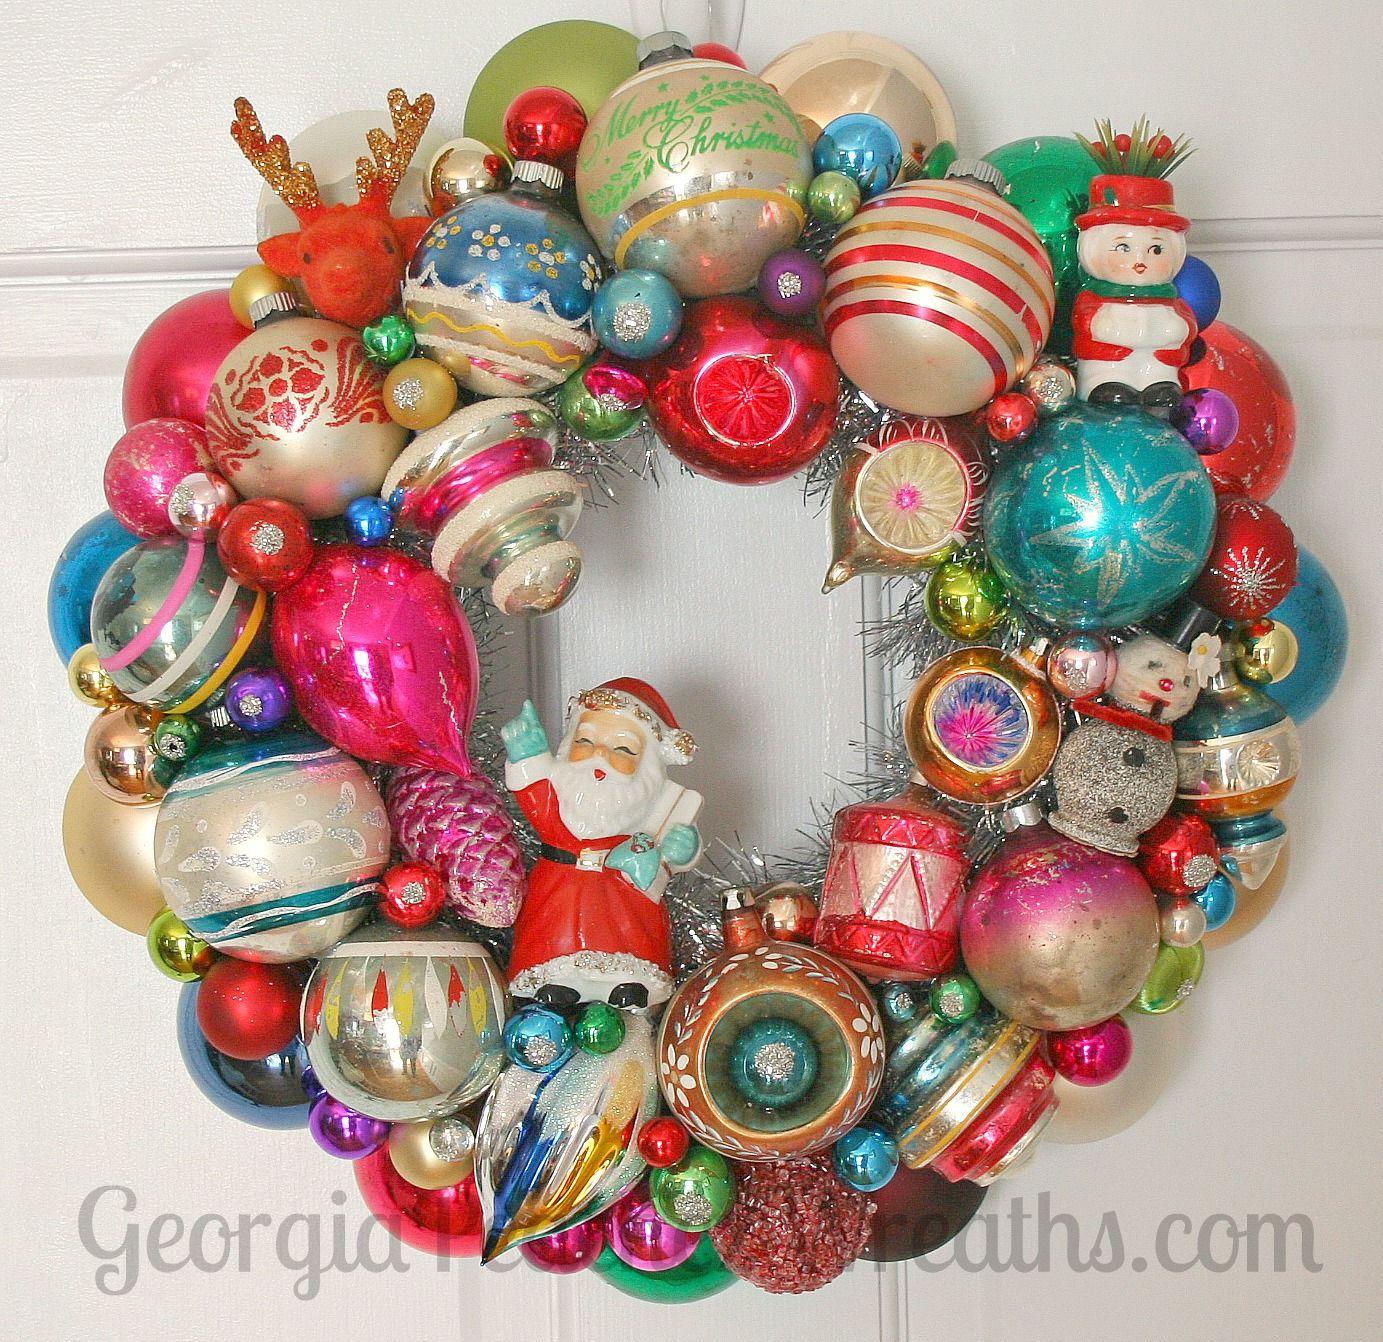 Georgiapeachez Wreaths Vintage Ornament Wreath Christmas Ornament Wreath Vintage Christmas Ornaments